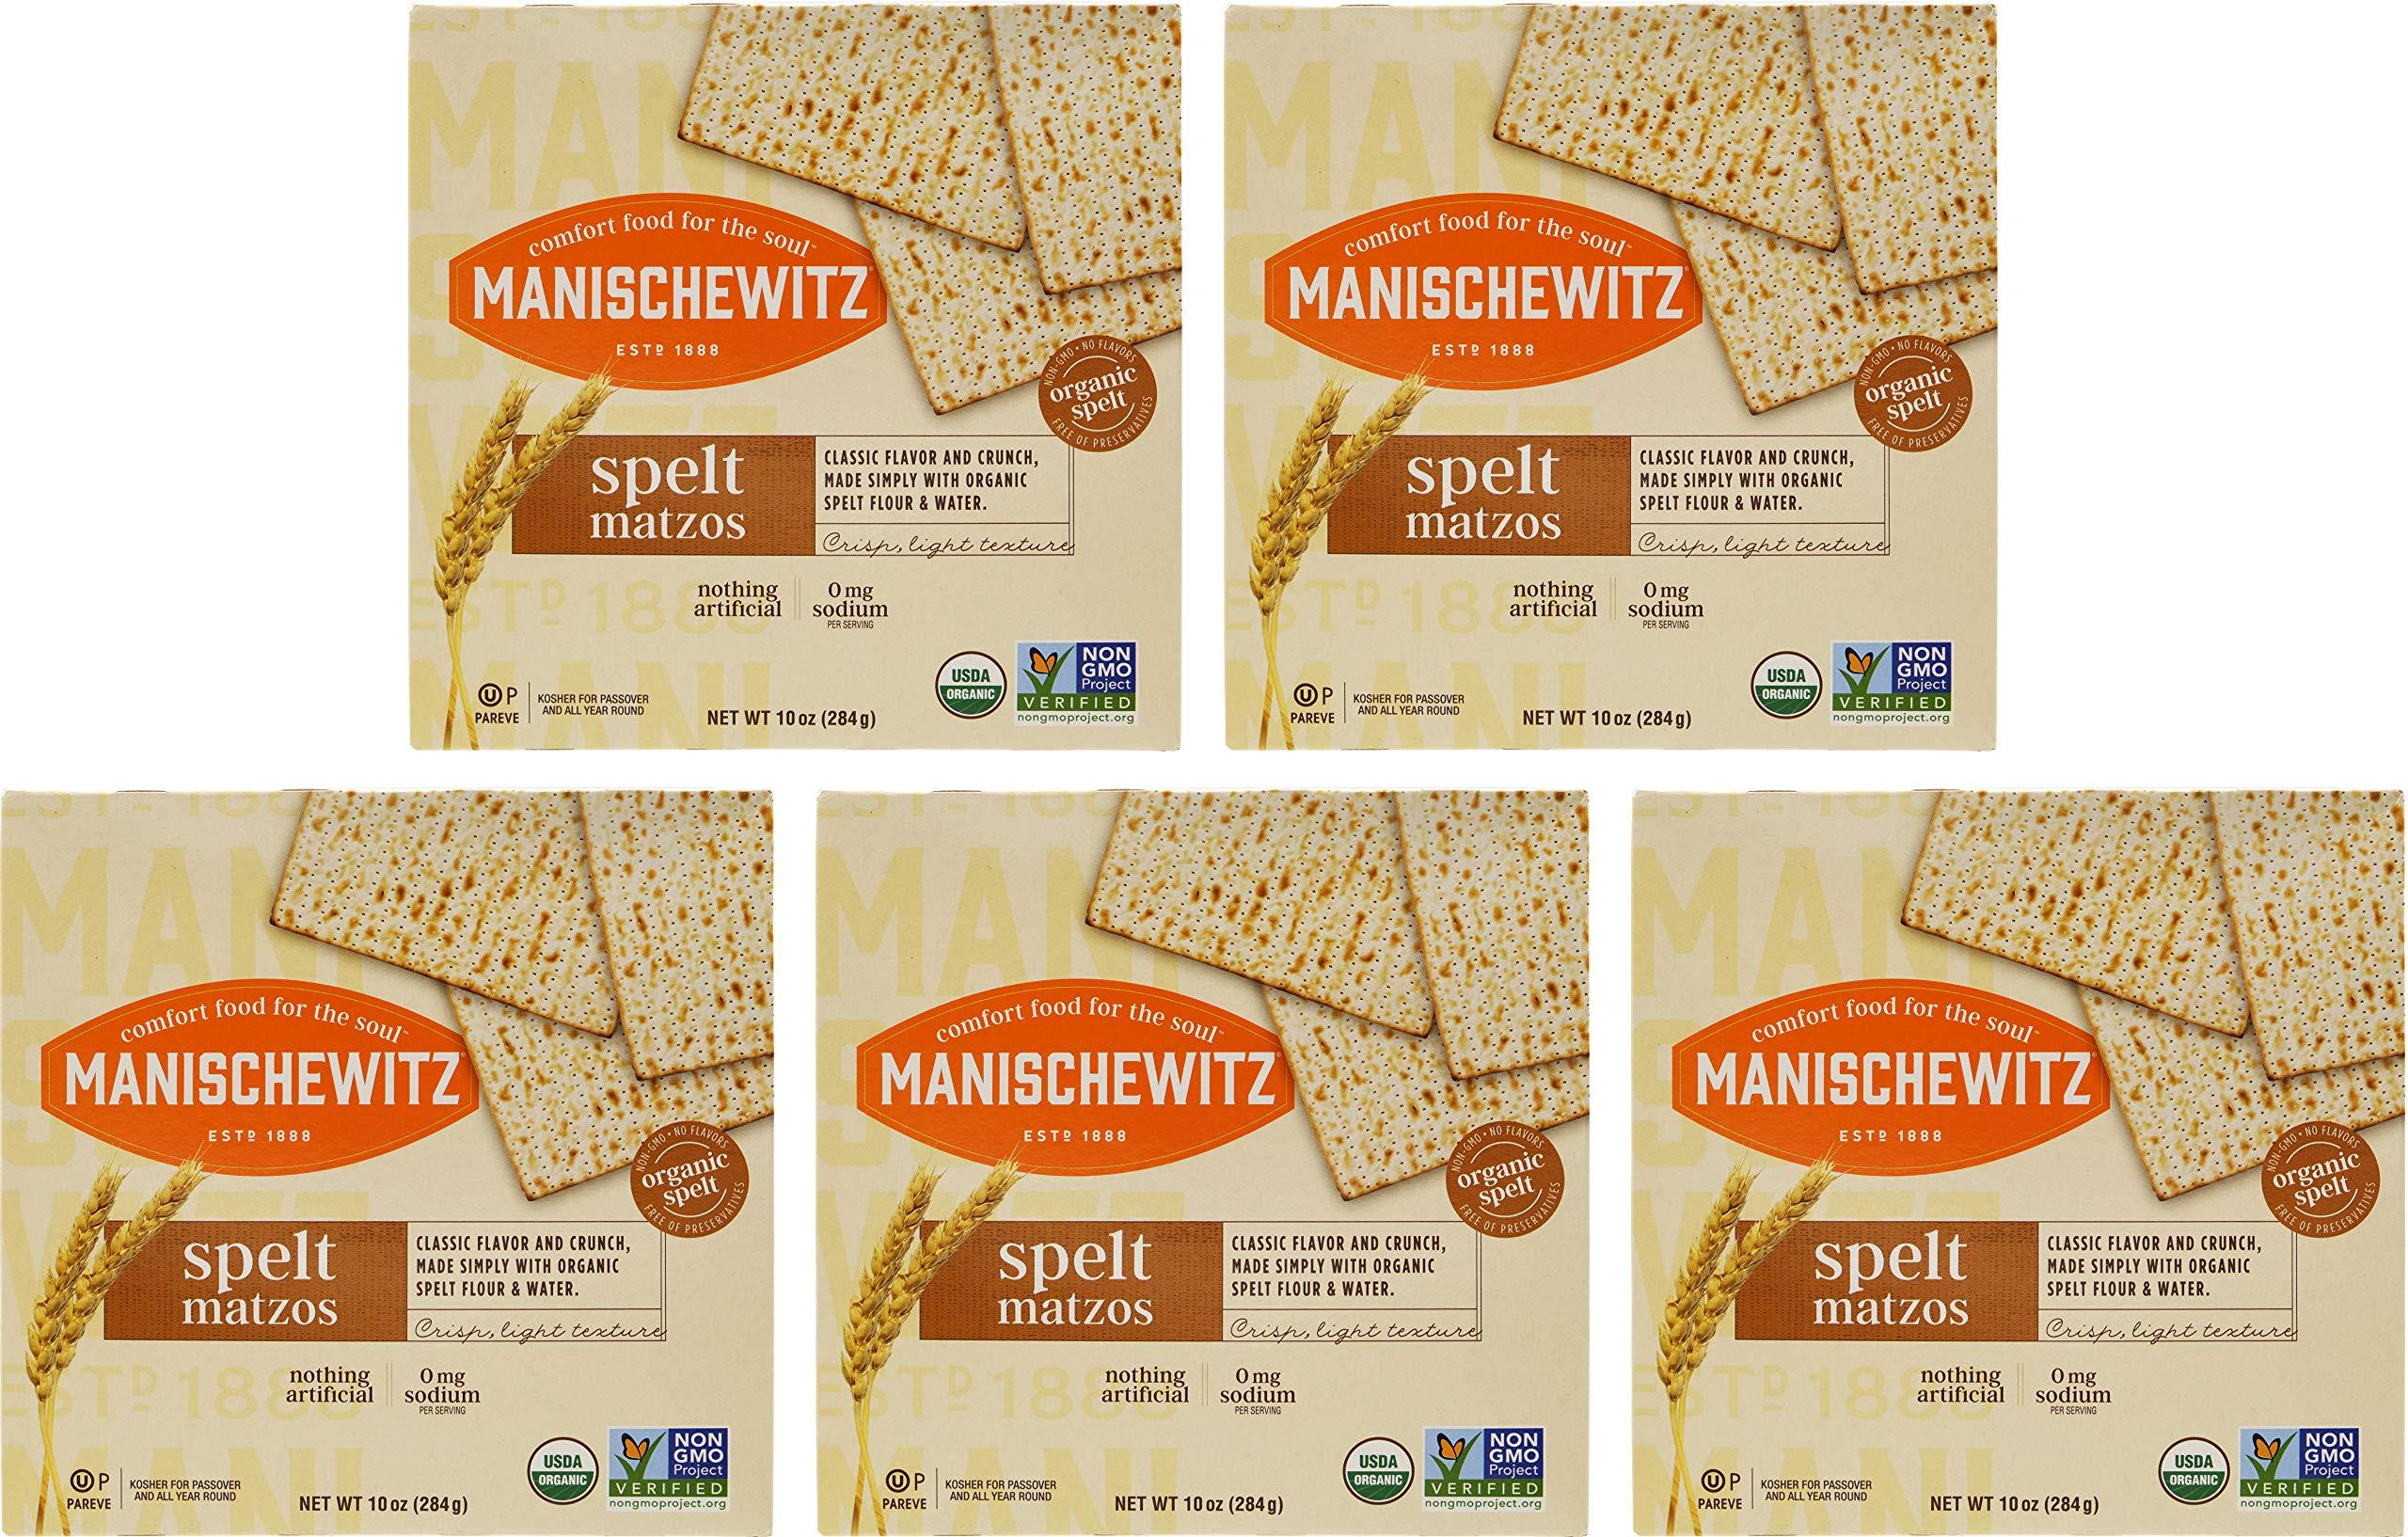 Manischewitz Organic Spelt Matzo Cracker Kosher For Passover, 10 Ounce (5-Pack)